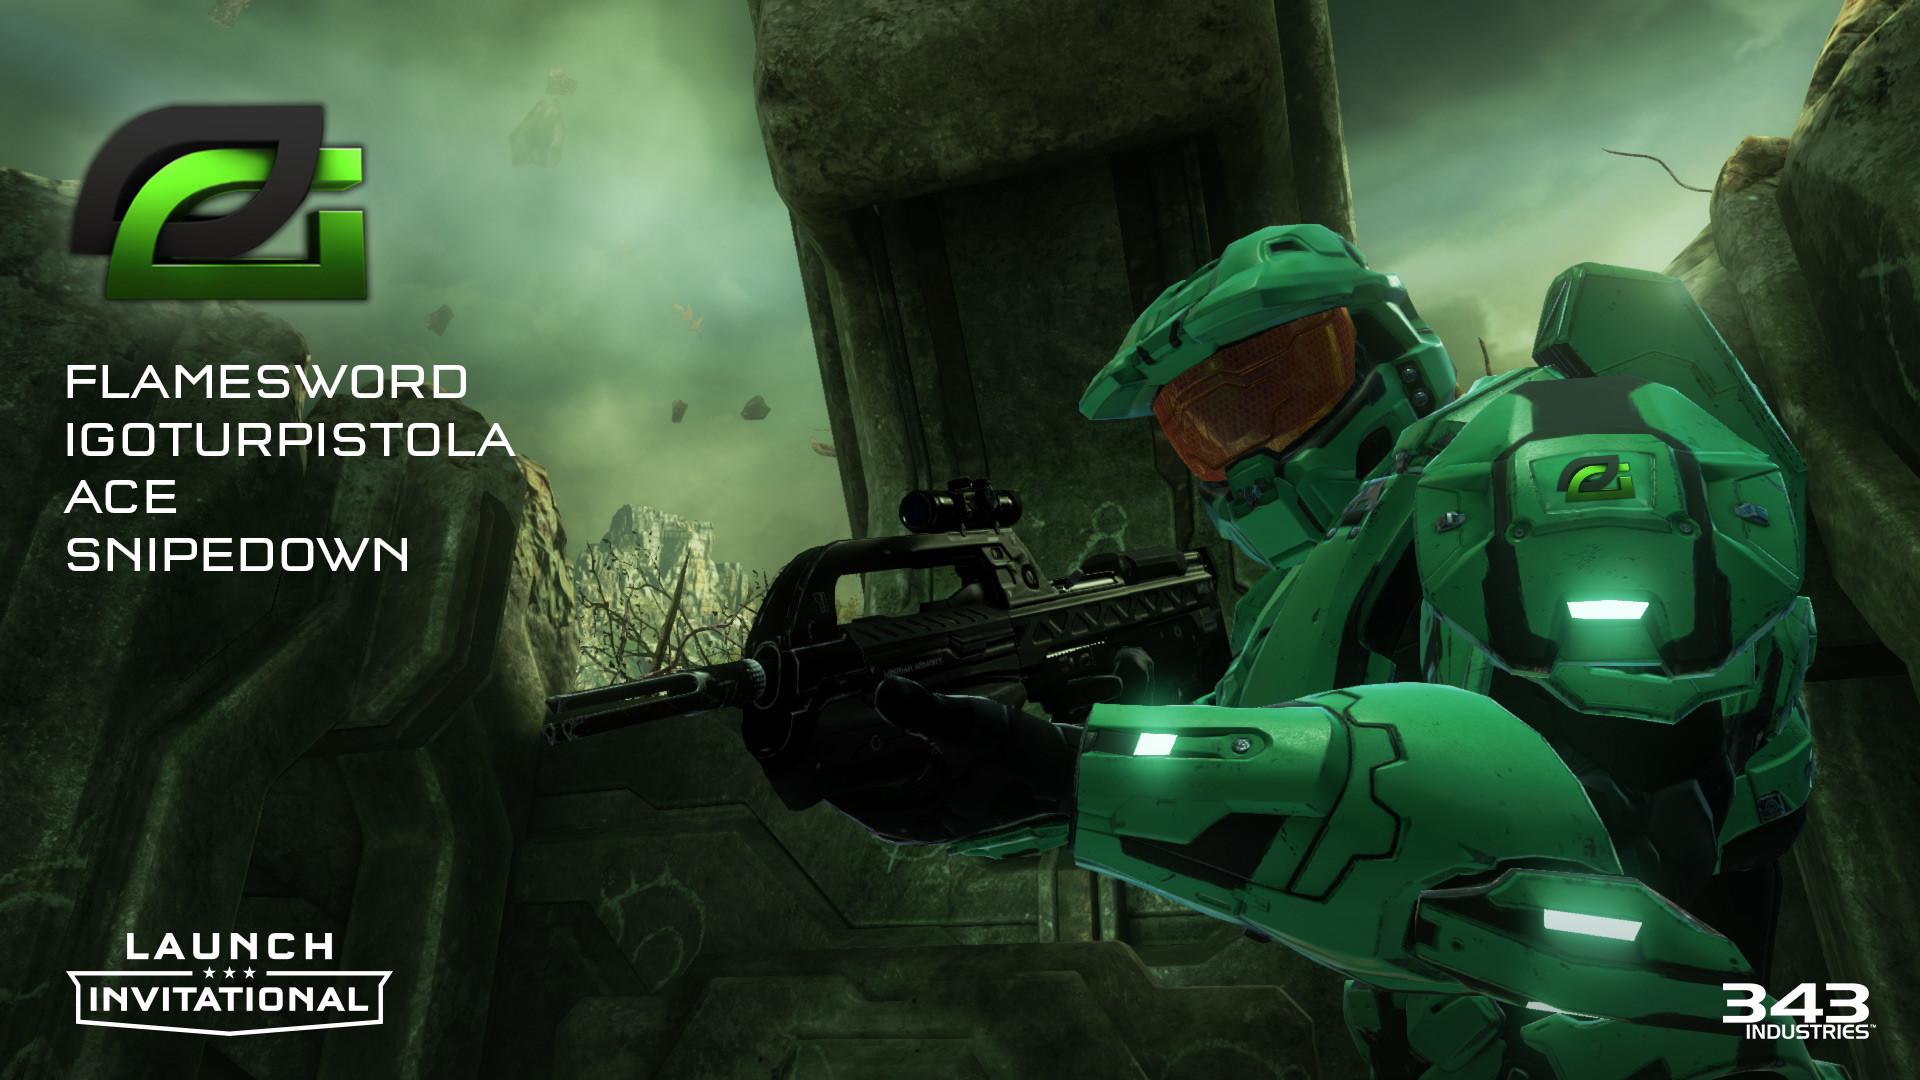 Res: 1920x1080, Optic Gaming Halo TCM Halo